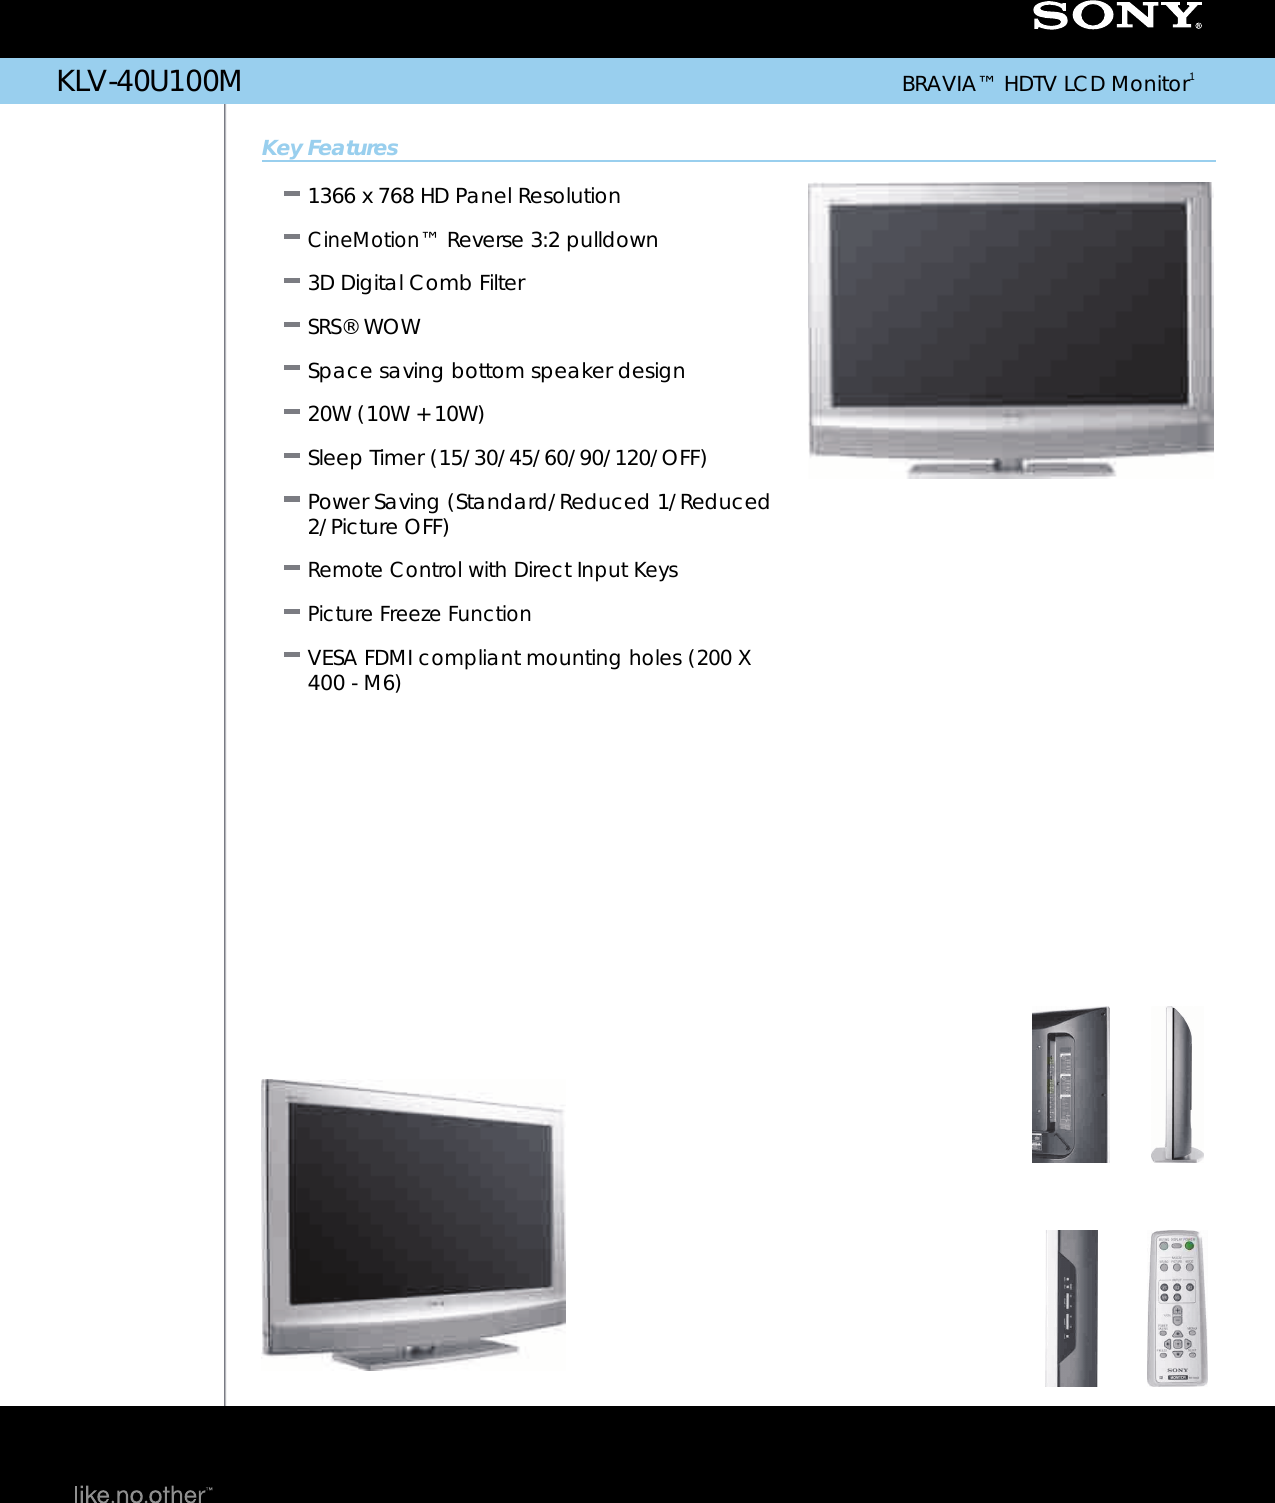 sony klv 40u100m user manual marketing specifications klv40u100m mksp rh usermanual wiki Sony Bravia TV HDMI Ports Sony BRAVIA Connection Diagram